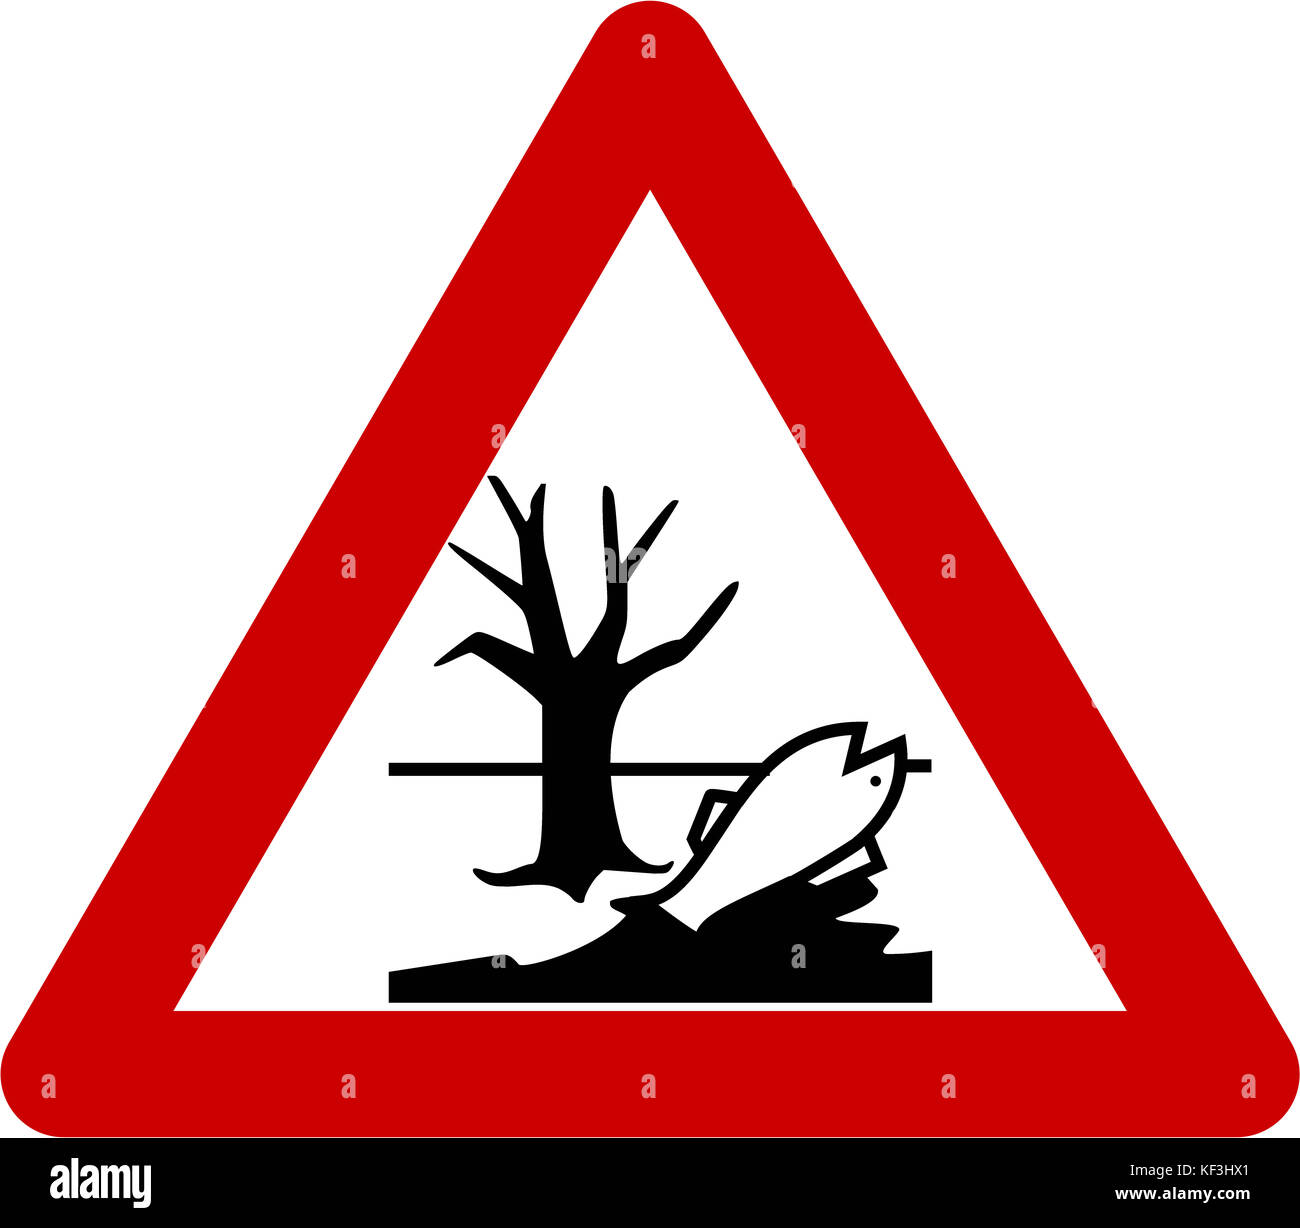 Irritant symbol stock photos irritant symbol stock images alamy warning sign with harmful chemicals symbol stock image biocorpaavc